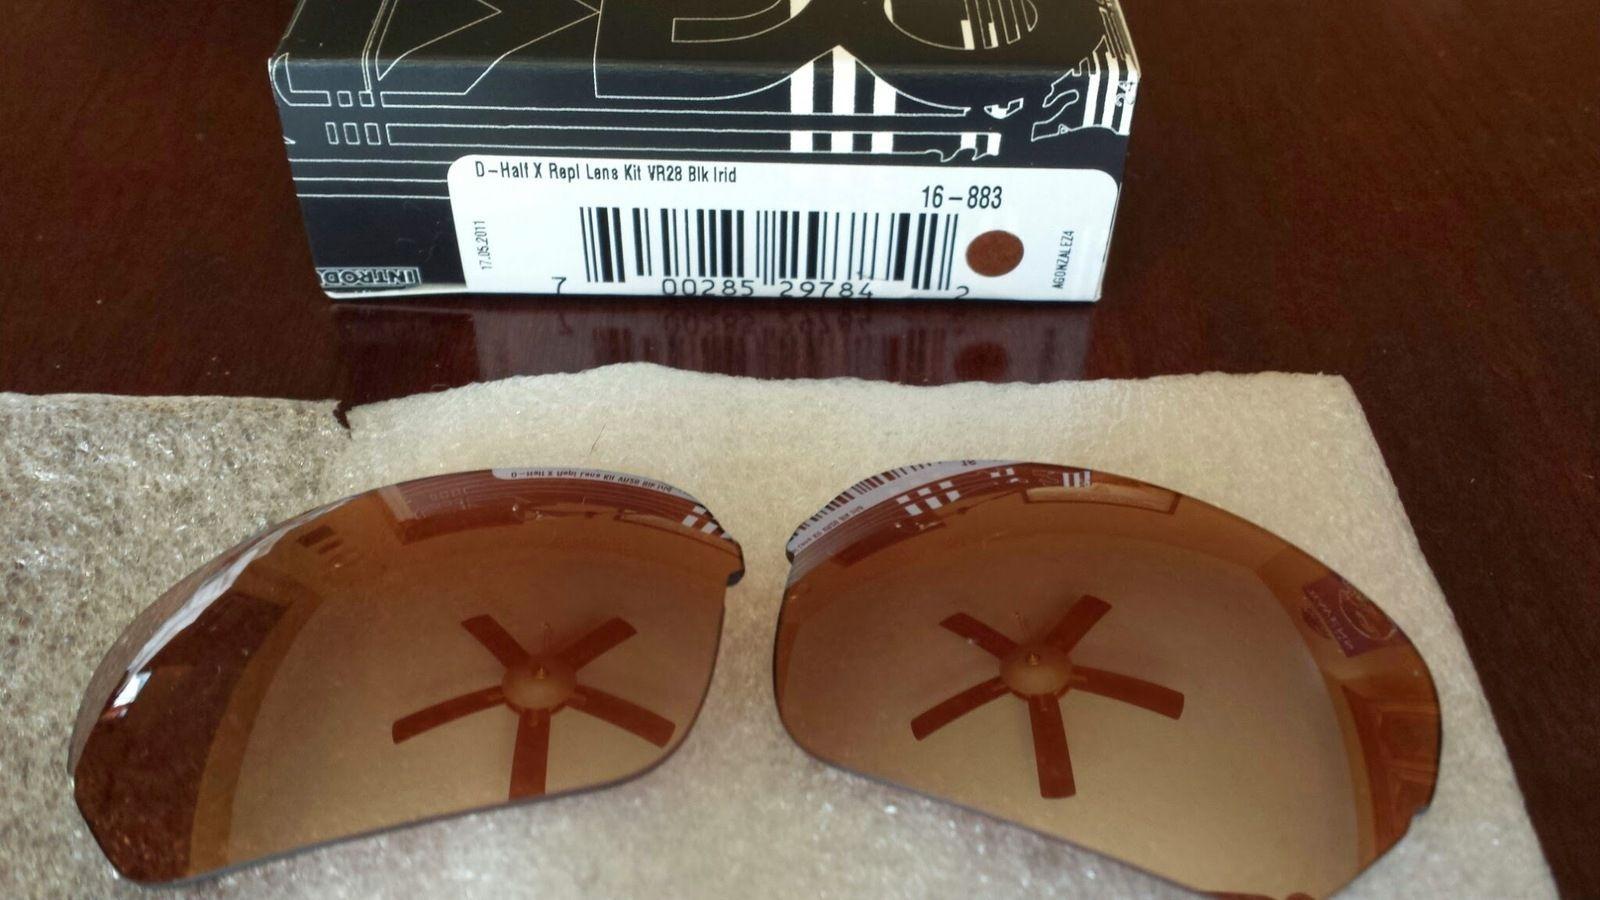 3x Half-X Lenses (Emerald, Ruby, VR28) - 20140320_153415.jpg